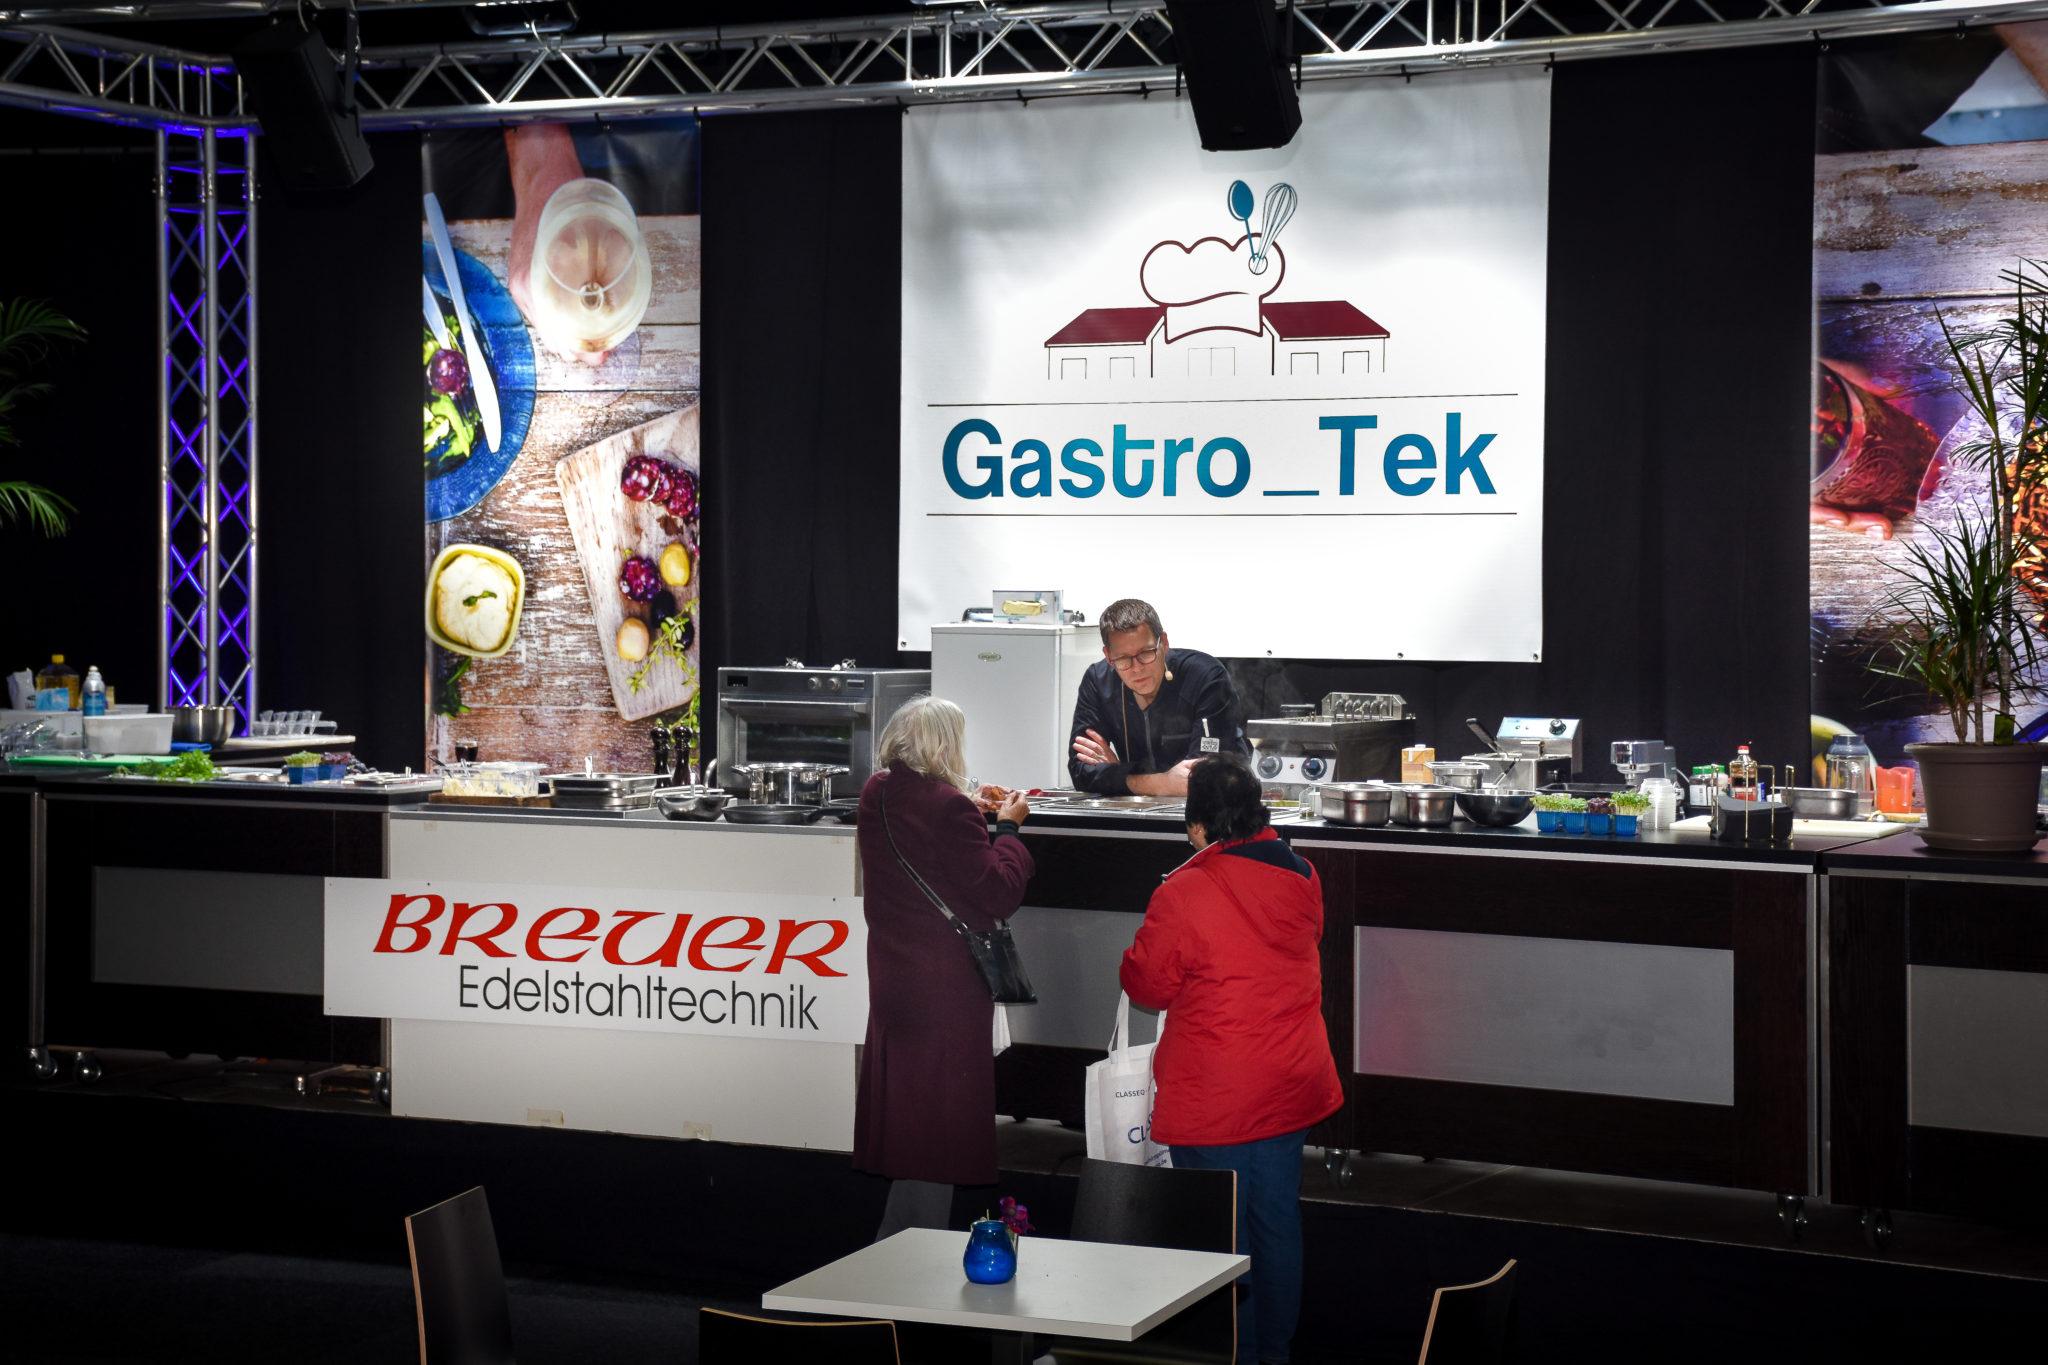 Gastro_Tek